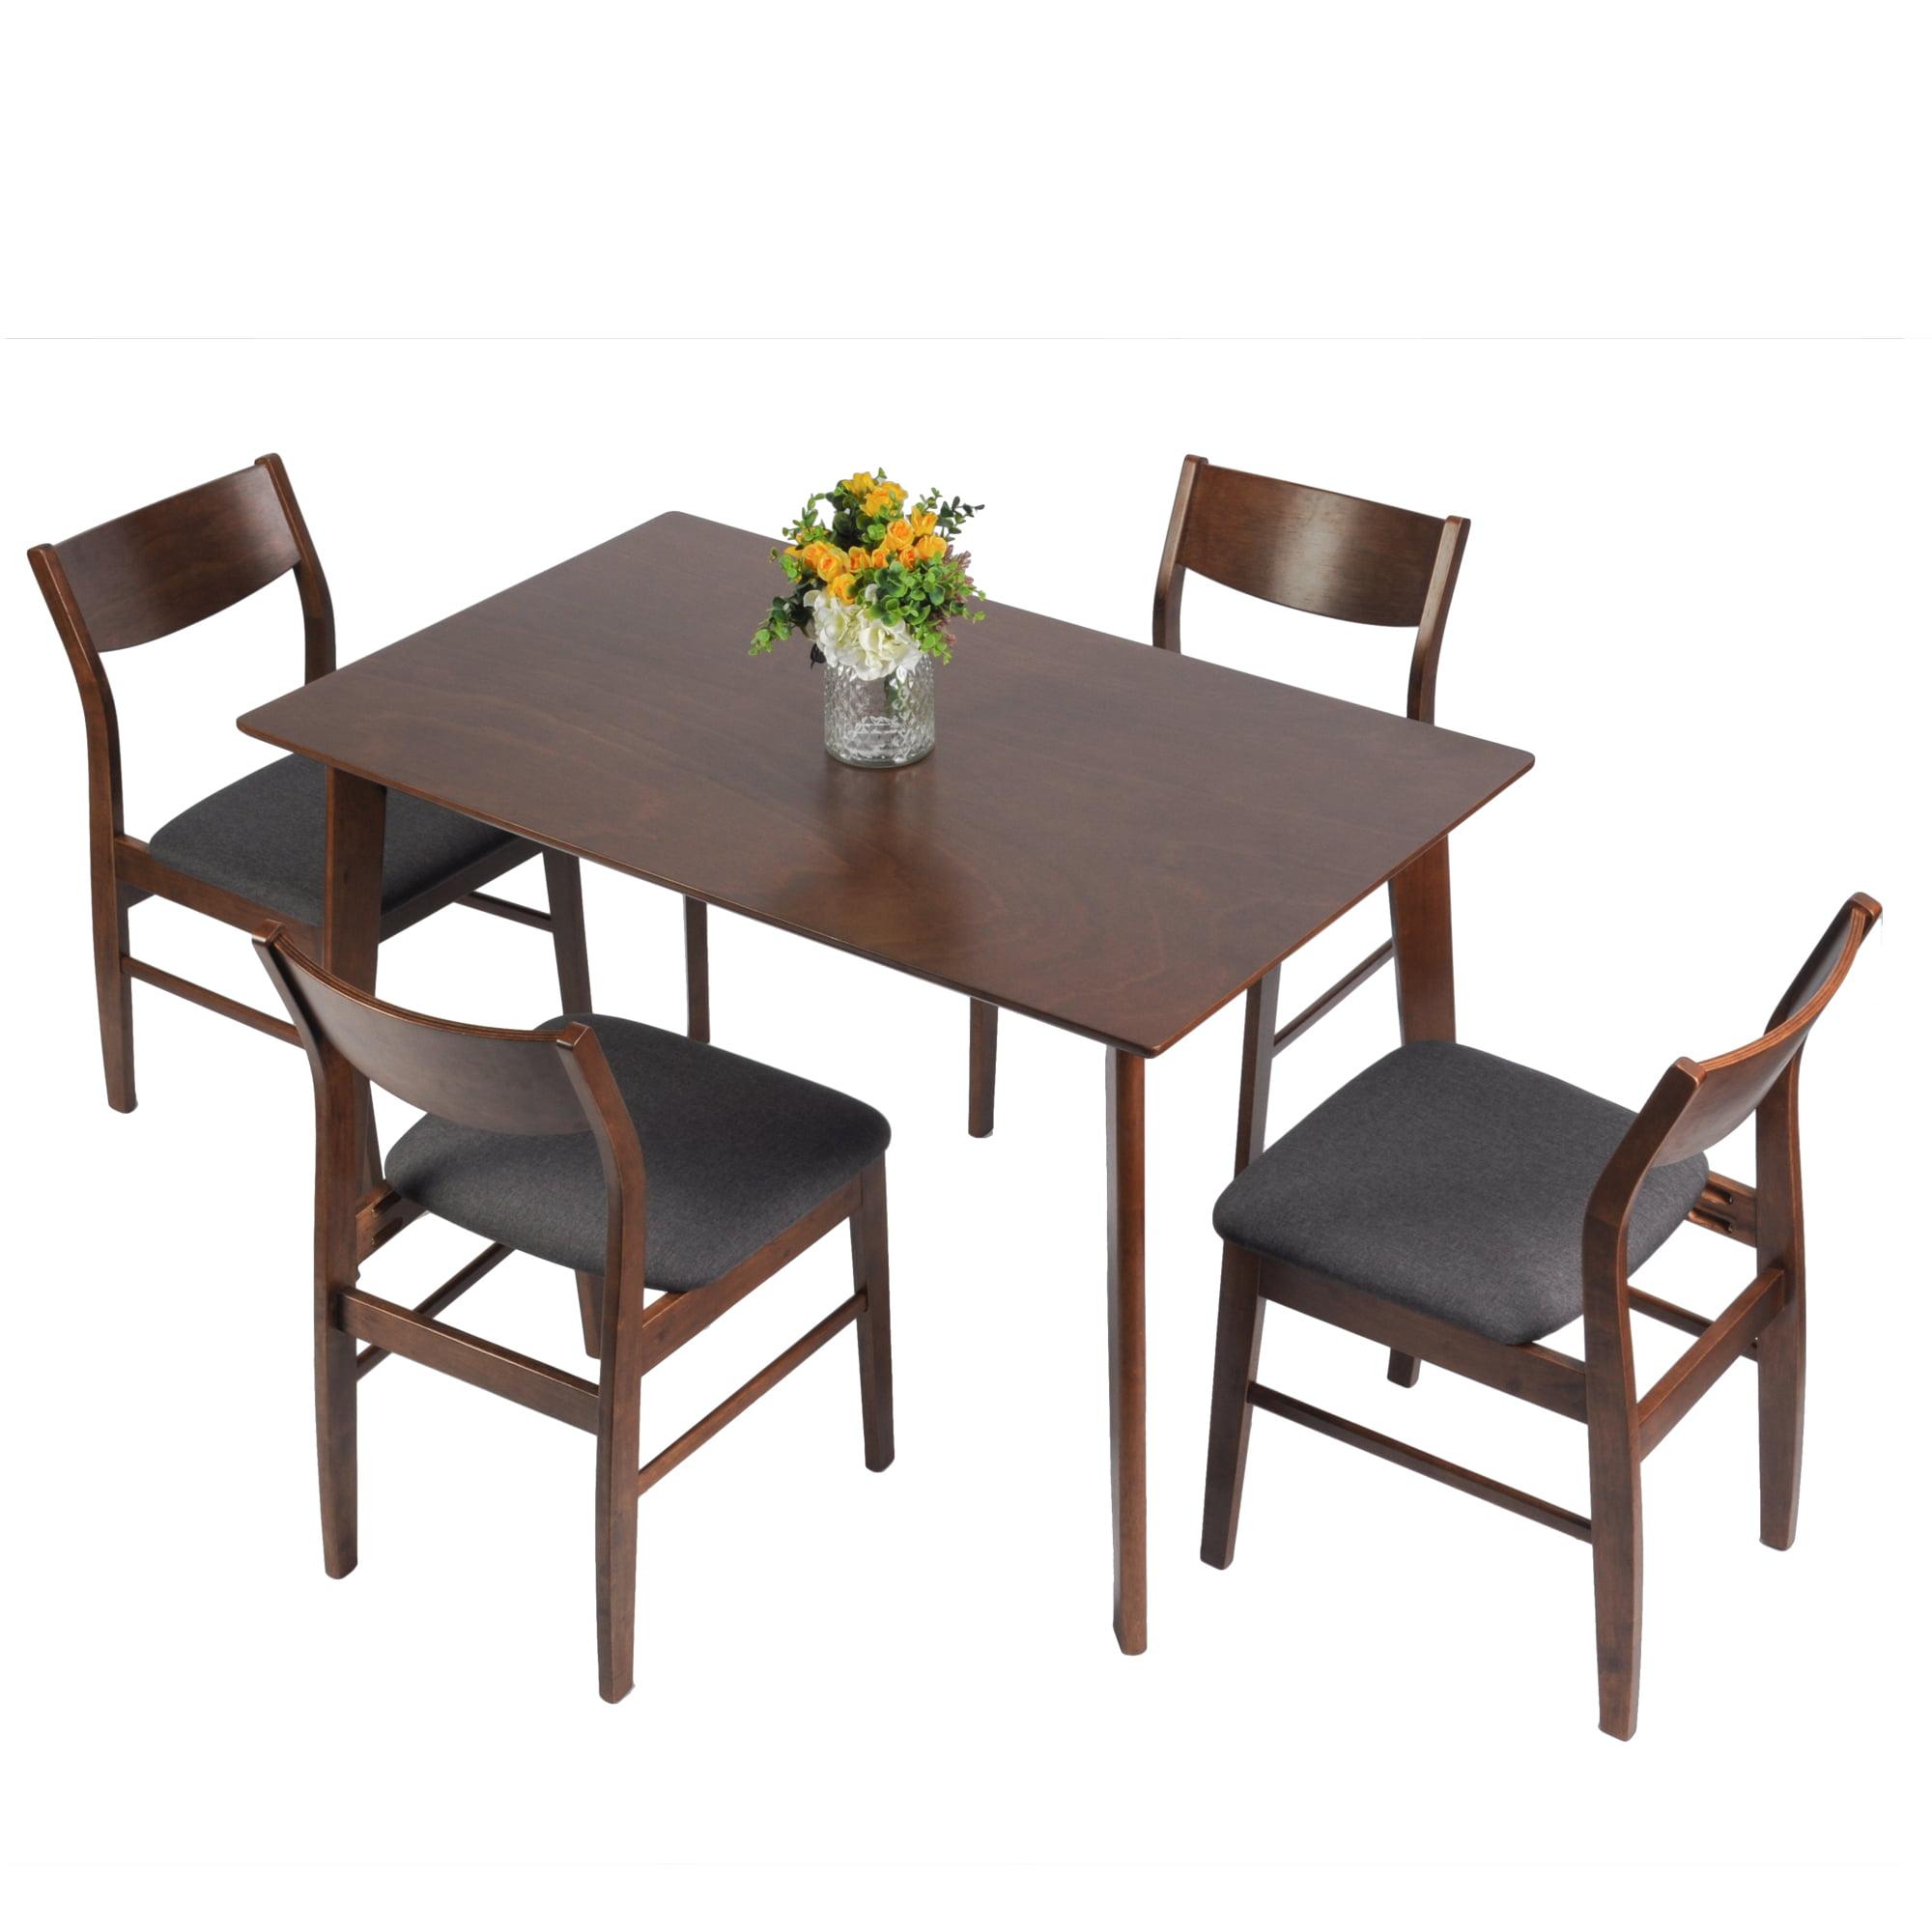 KARMAS PRODUCT 5 Piece Dining Room Table Set Mid Century ...